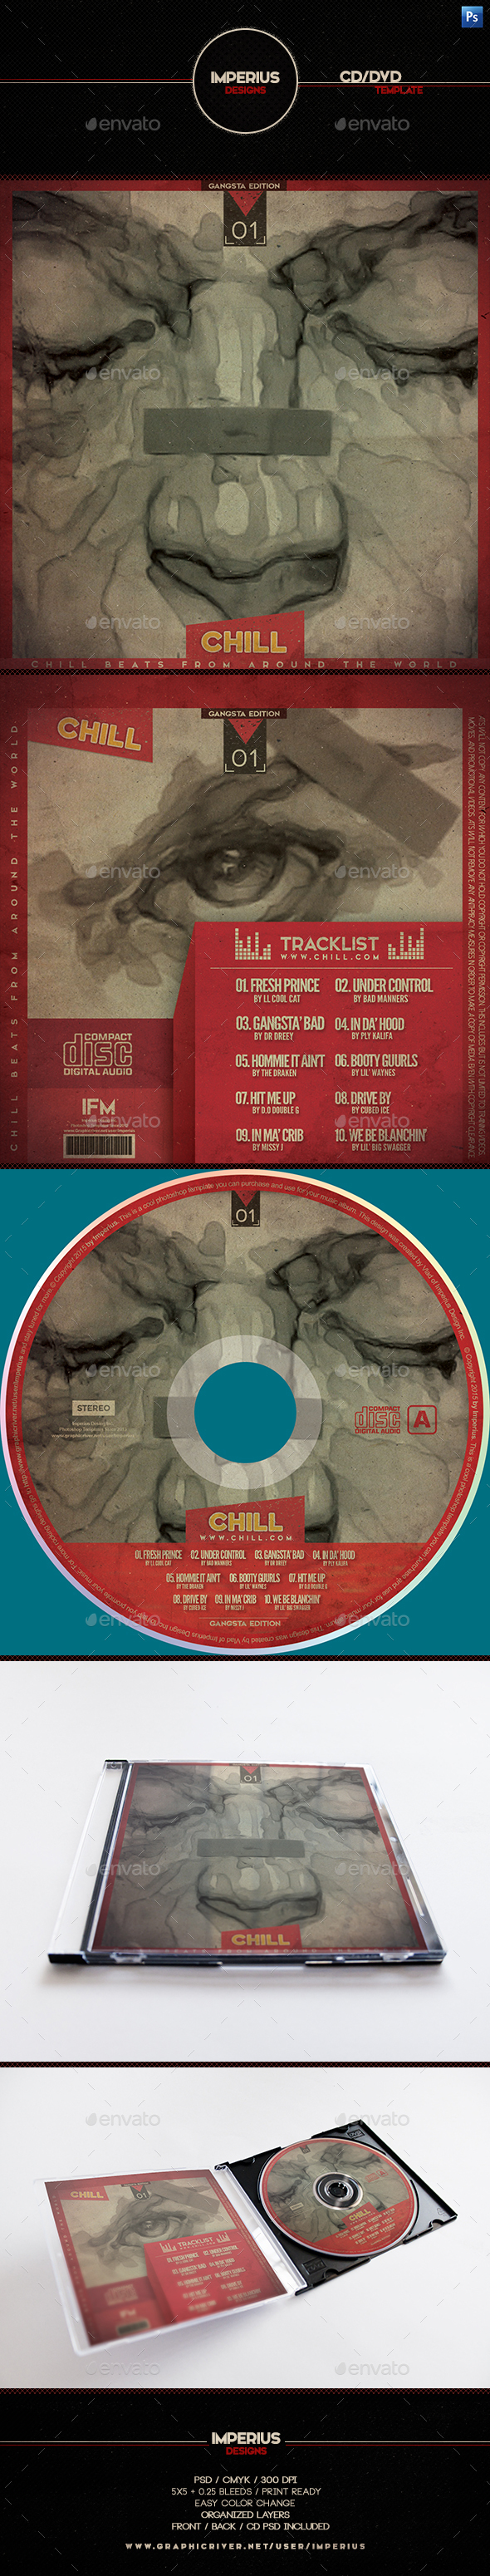 Chill CD/DVD Cover - CD & DVD Artwork Print Templates